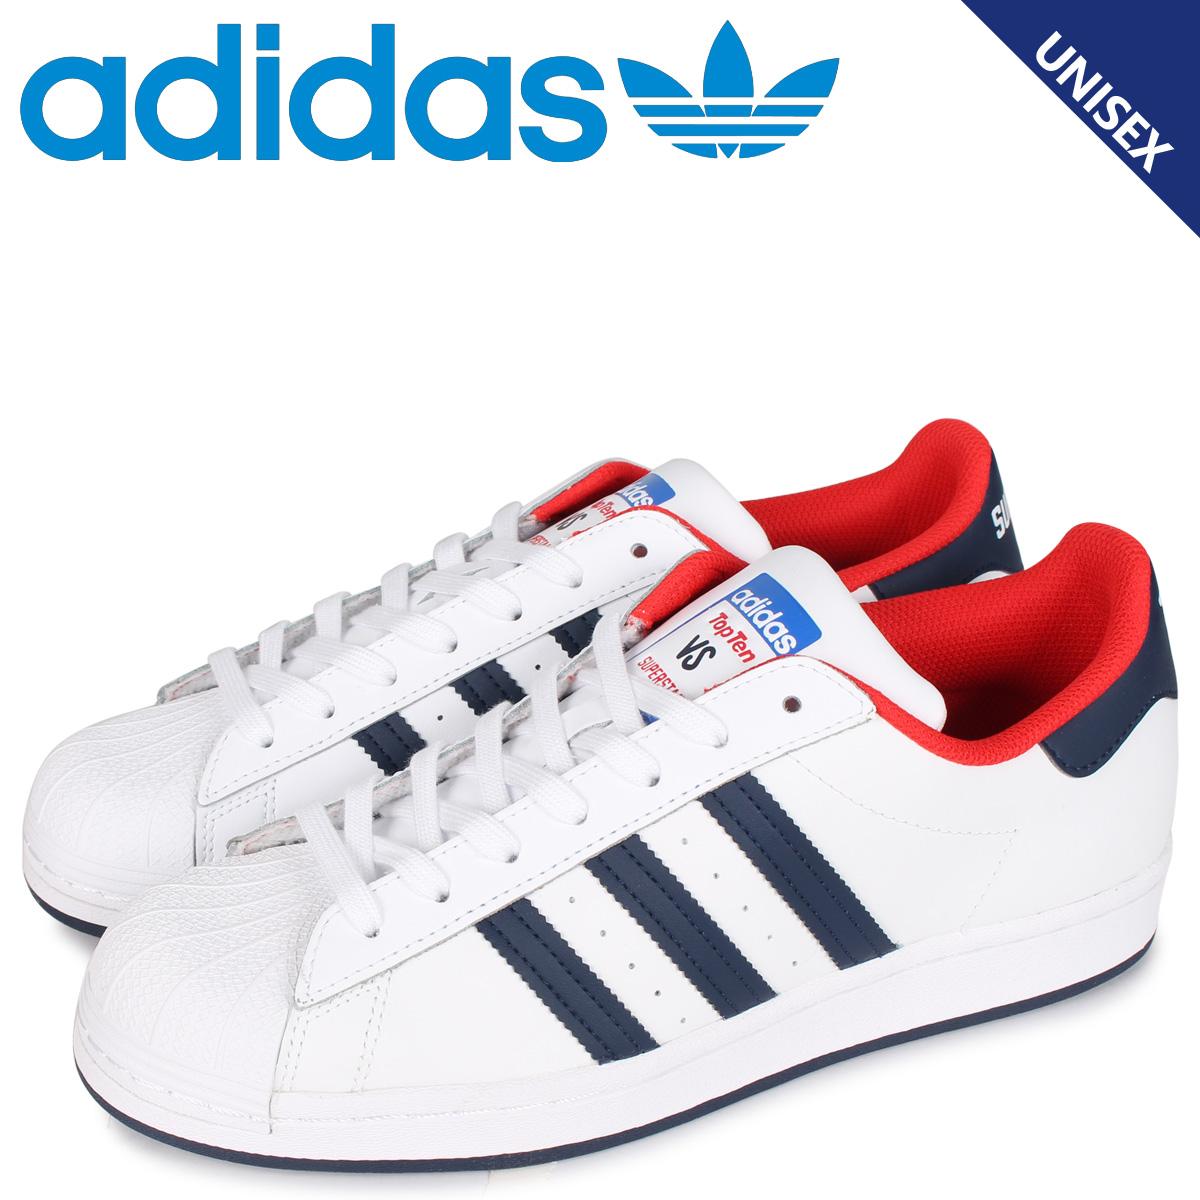 adidas Originals アディダス オリジナルス スーパースター スニーカー メンズ レディース SUPER STAR W ホワイト 白 FV8270 [4/1 新入荷]